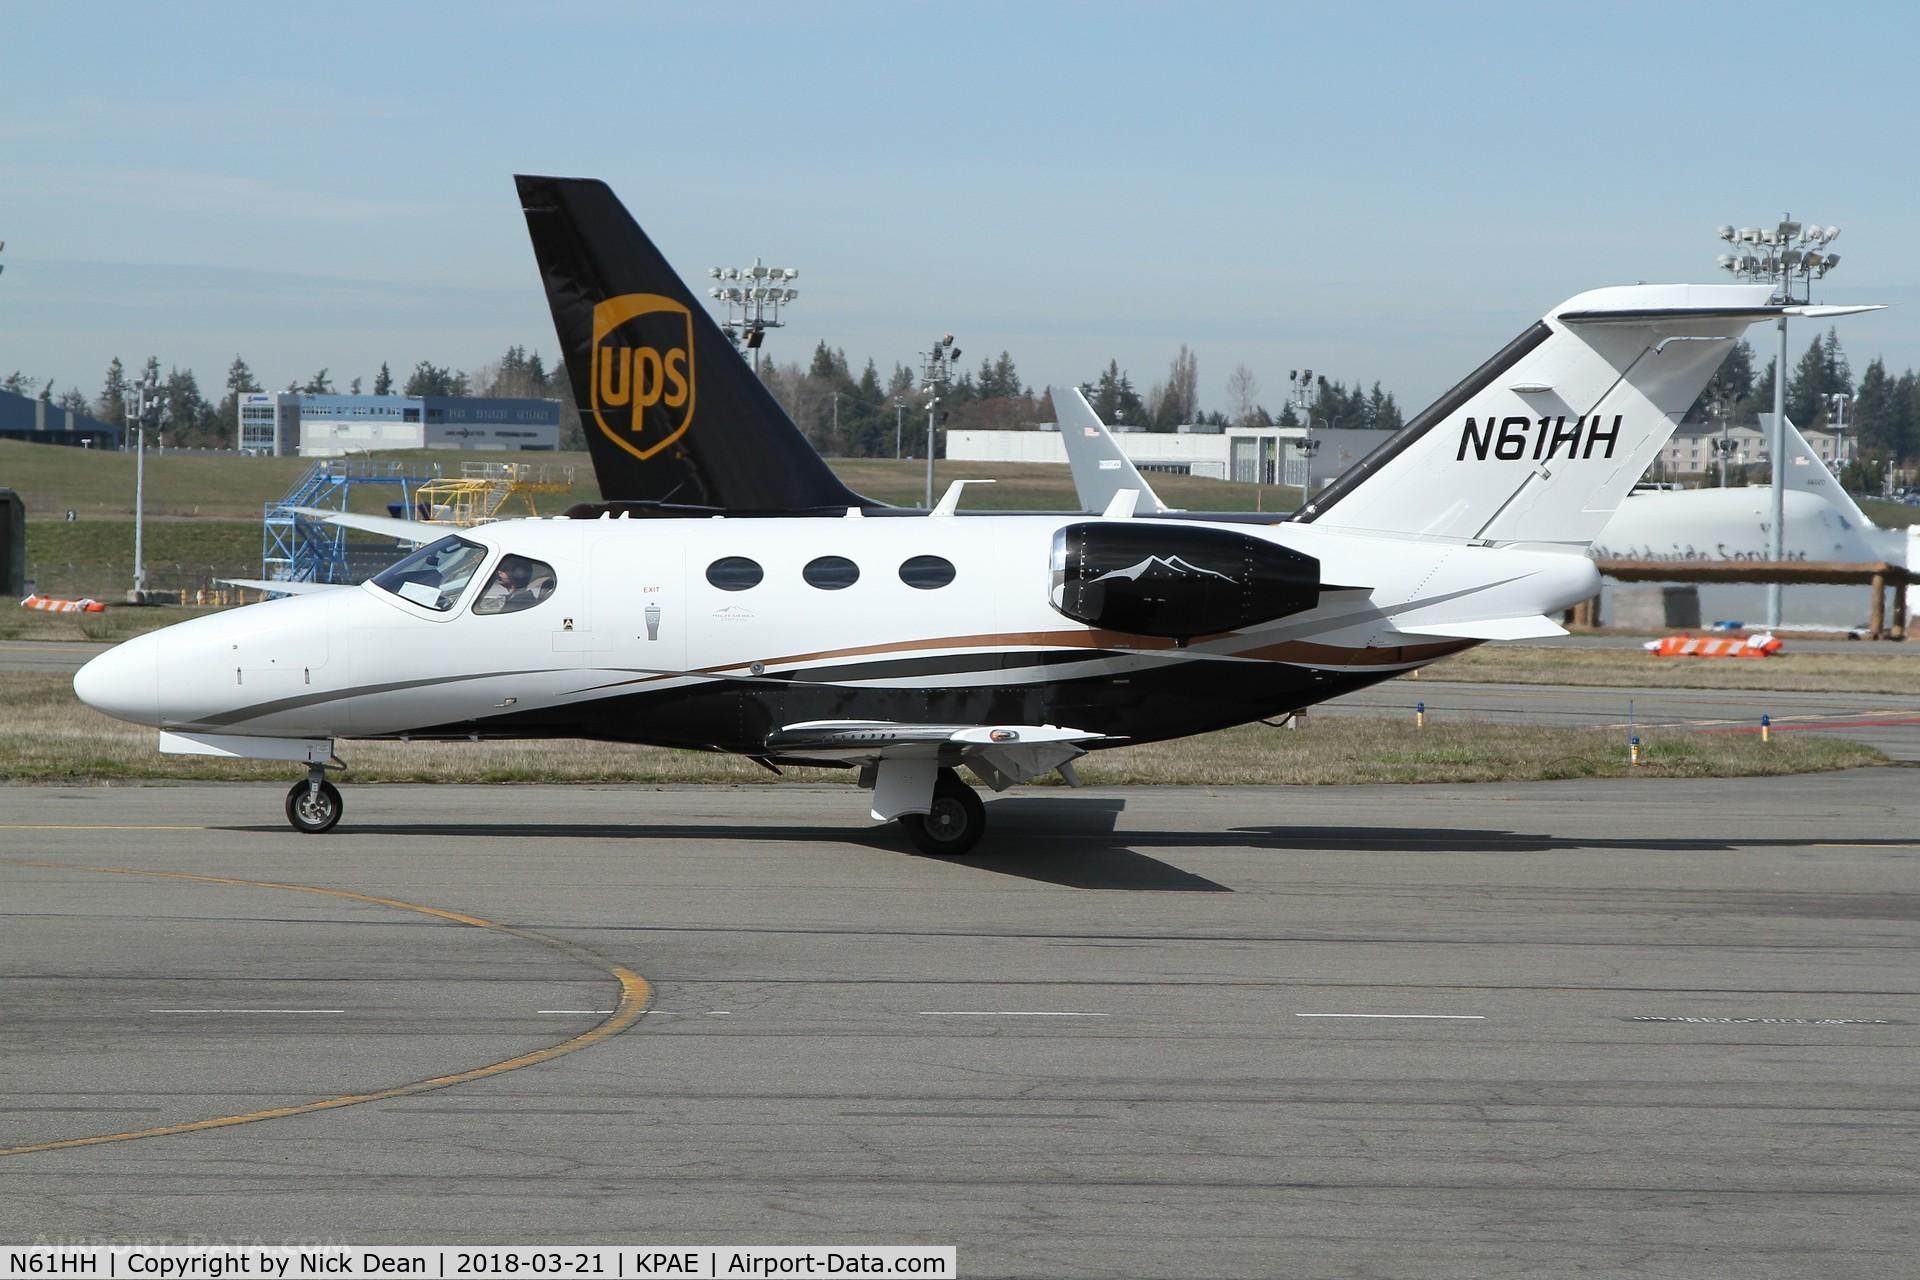 N61HH, 2011 Cessna 510 Citation Mustang Citation Mustang C/N 510-0390, PAE/KPAE